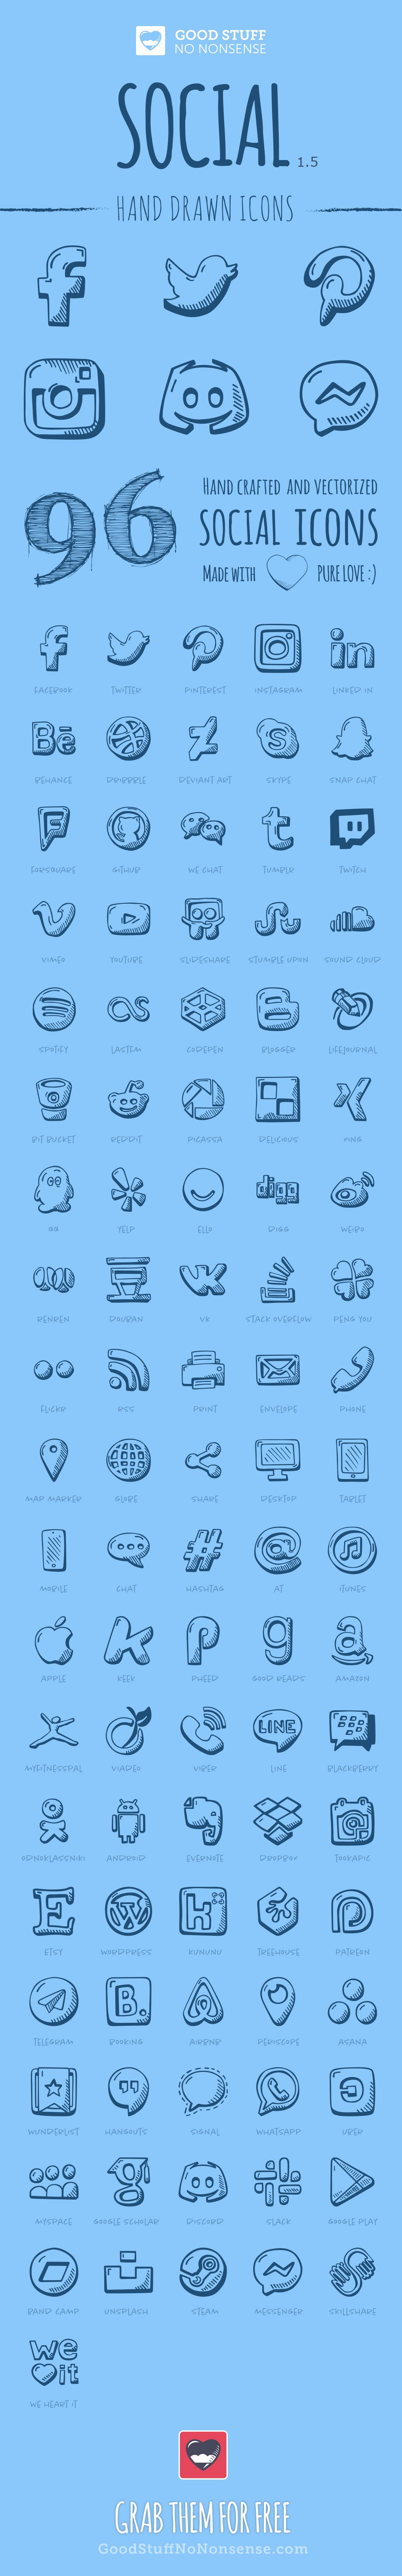 Icon icons free freebie social icons social media hand drawn sketch outline